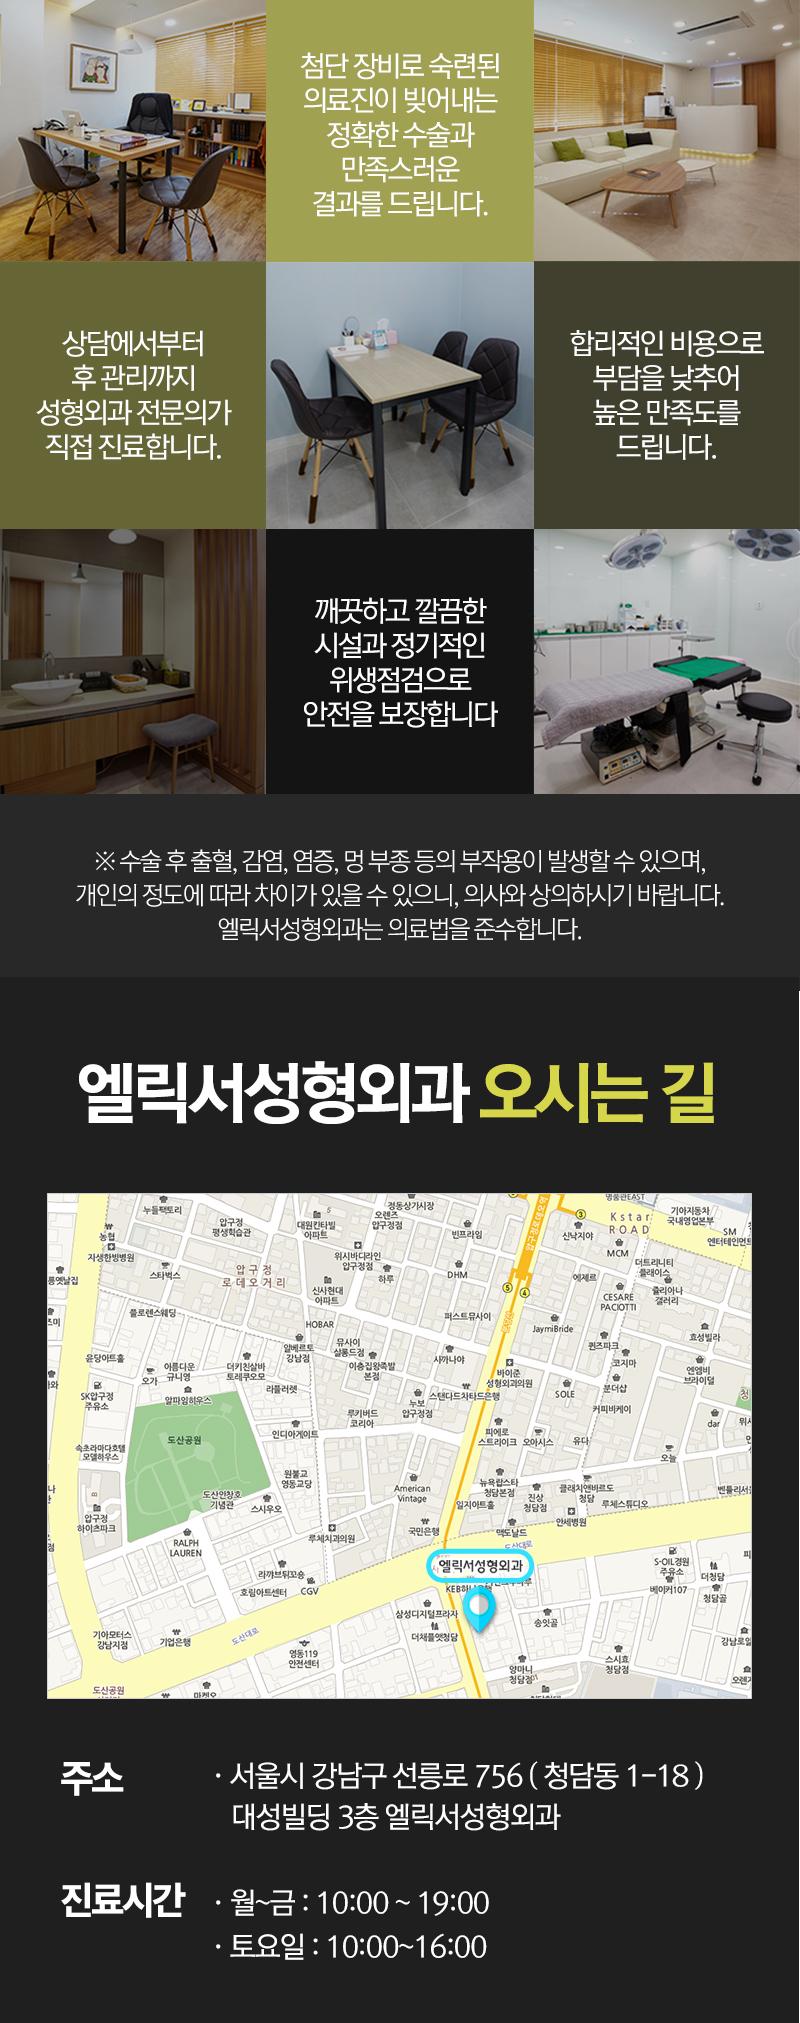 D event info bd07f0f4b663bf707e